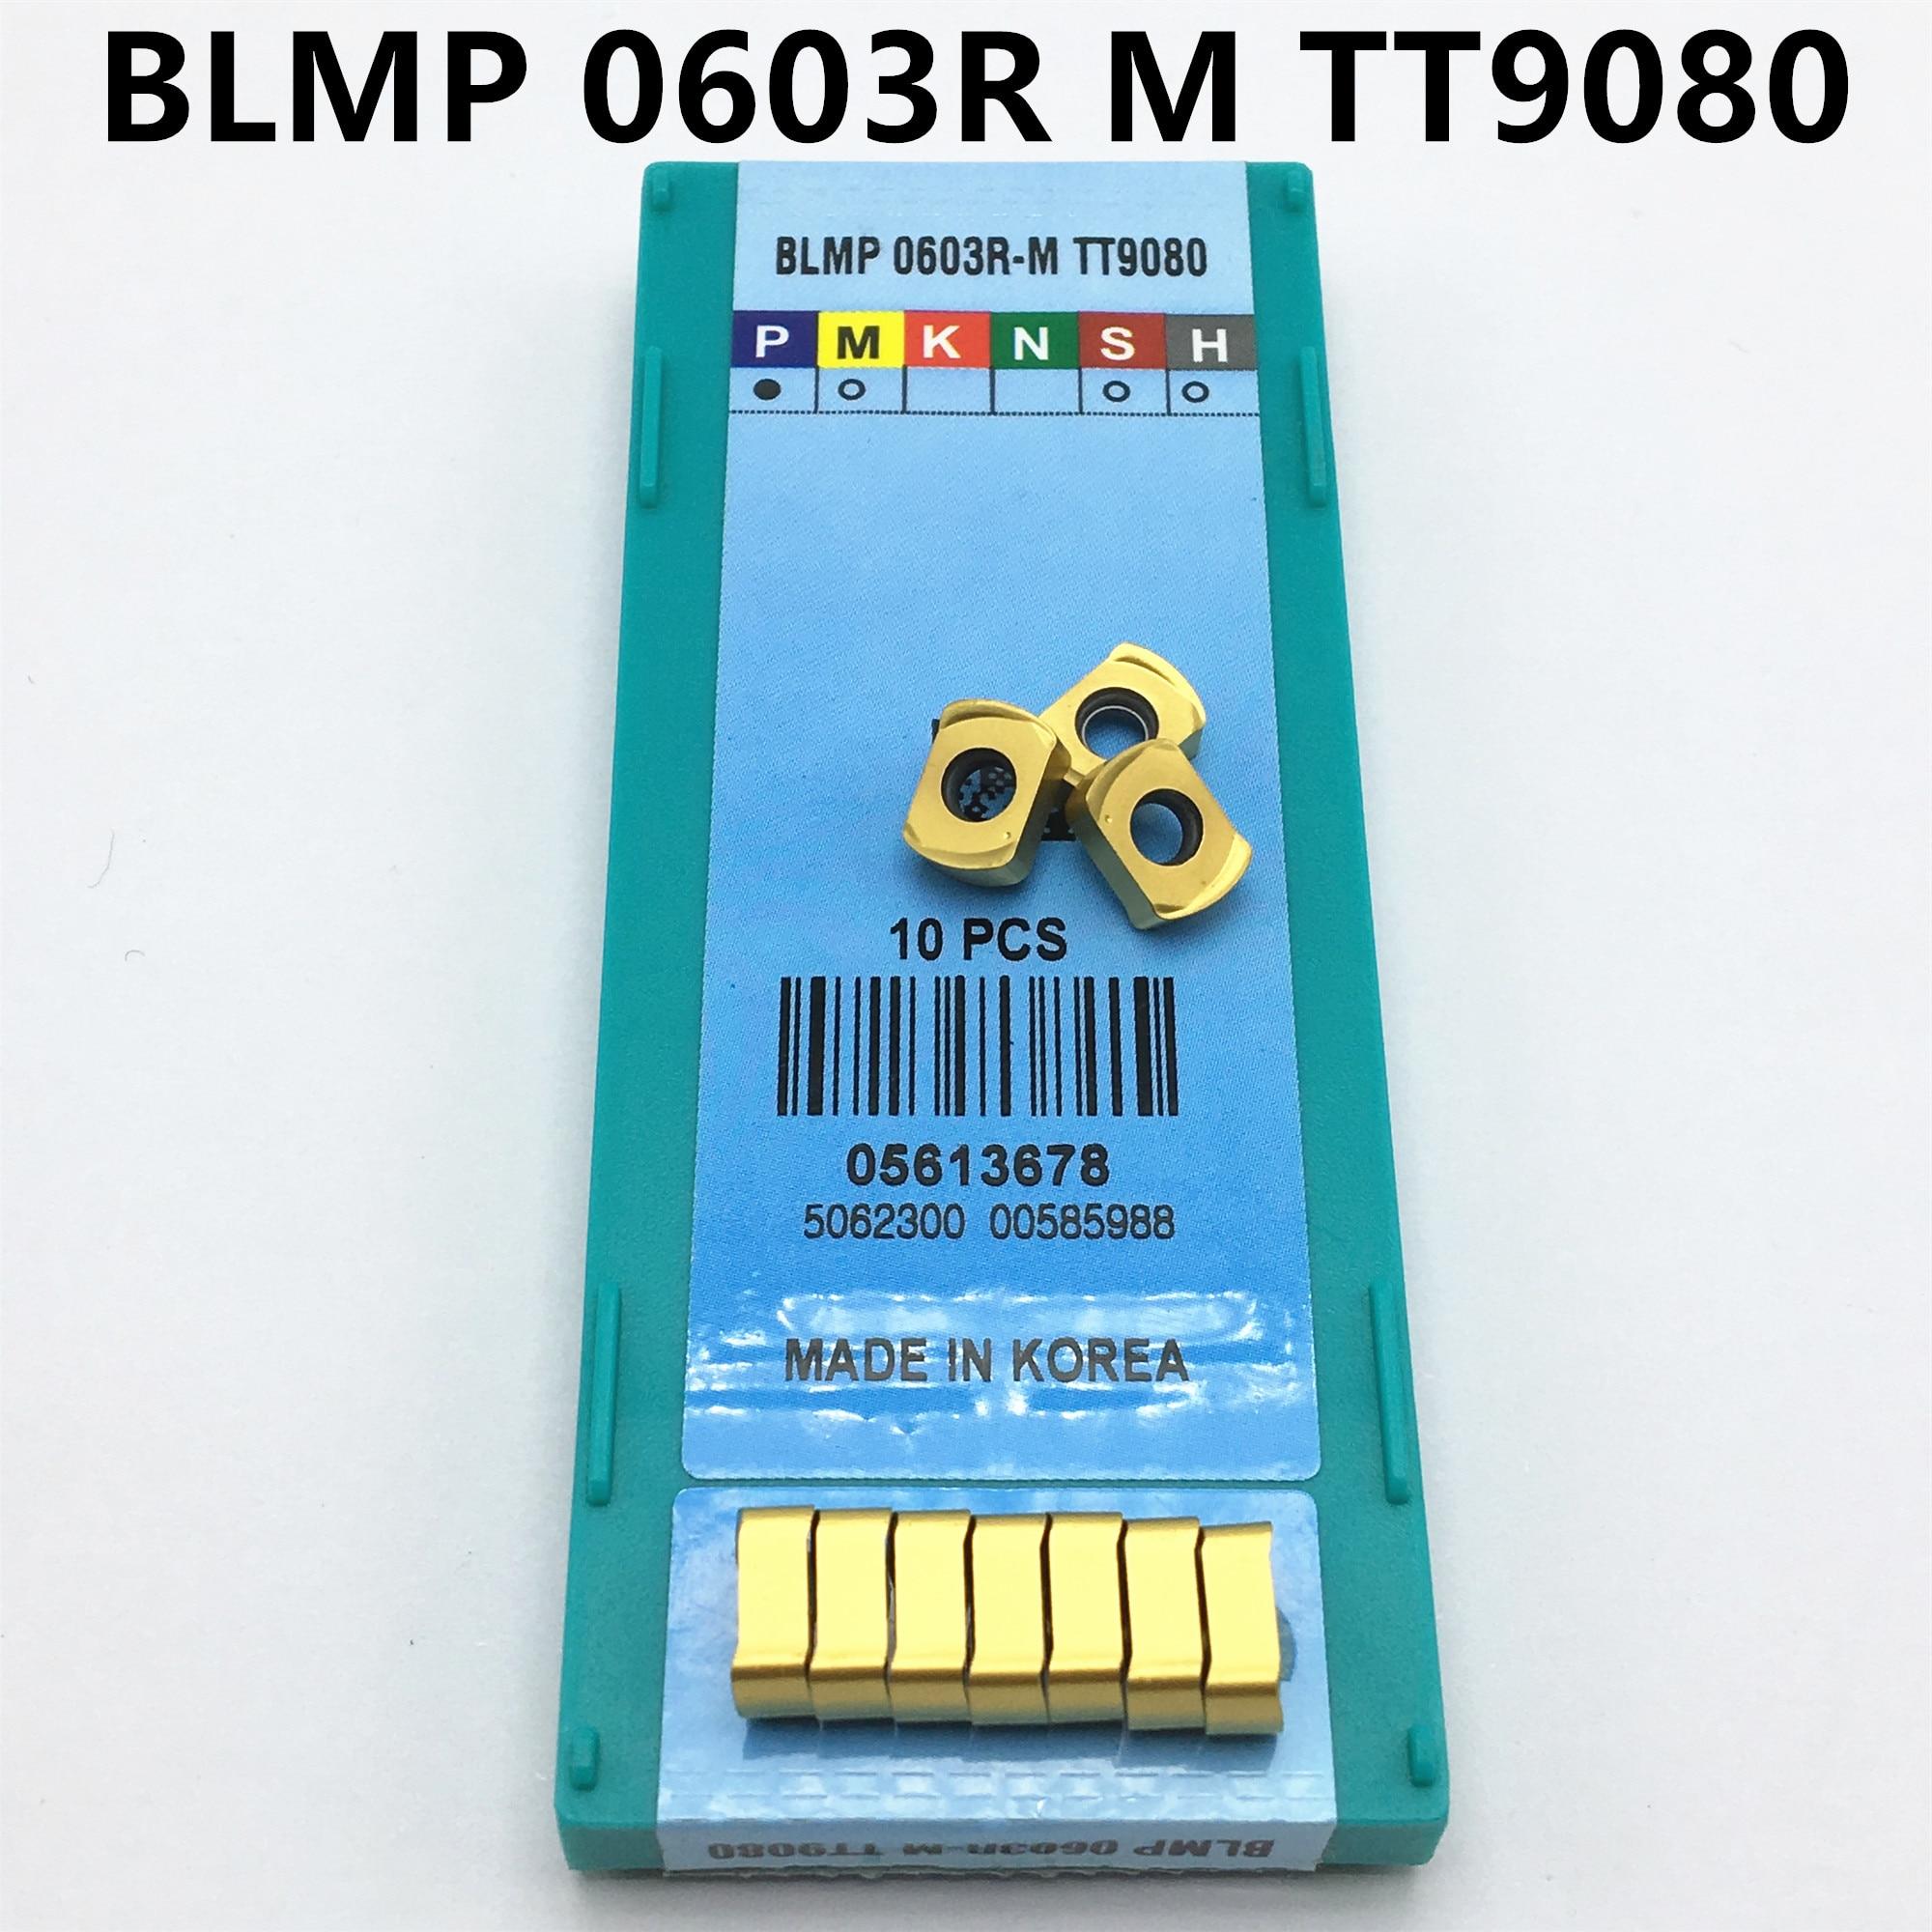 100PCS Carbide Insert BLMP 0603R M TT9080 Lathe Tool BLMP0603R Internal Turning Carbide CNC Machine Tool CVD + PVD Milling Tool